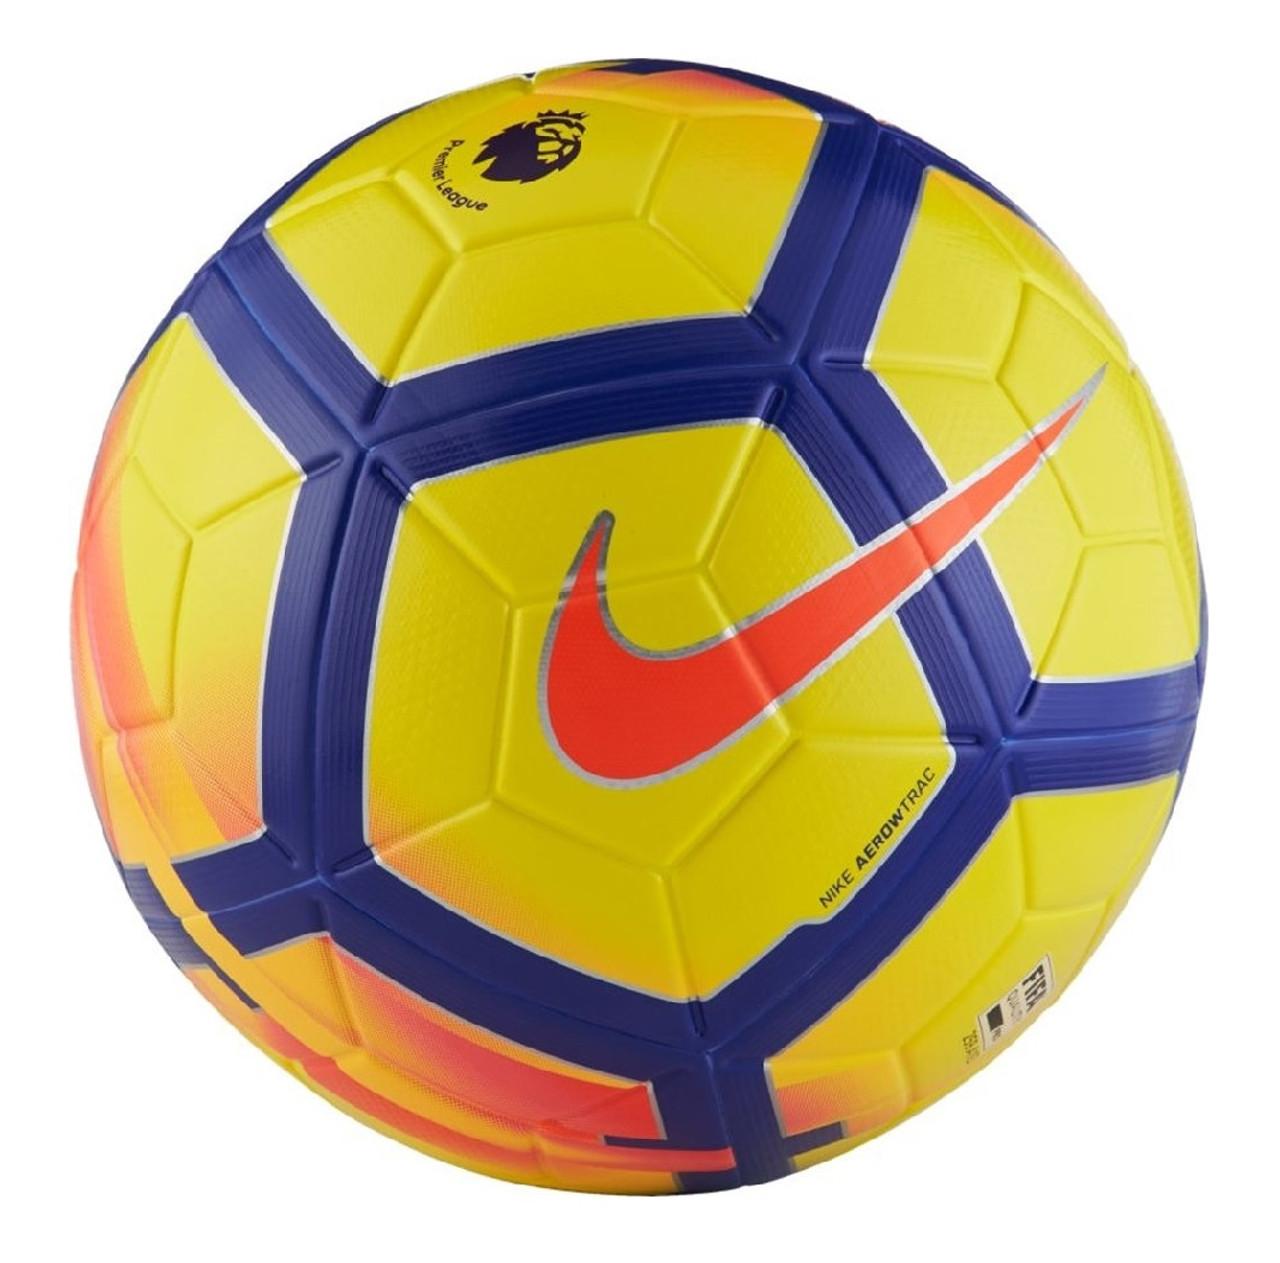 02f0d3b18 Nike Ordem V Premier League 17/18 Official Match Ball -  Yellow/Purple/Crimson (41518) - ohp soccer